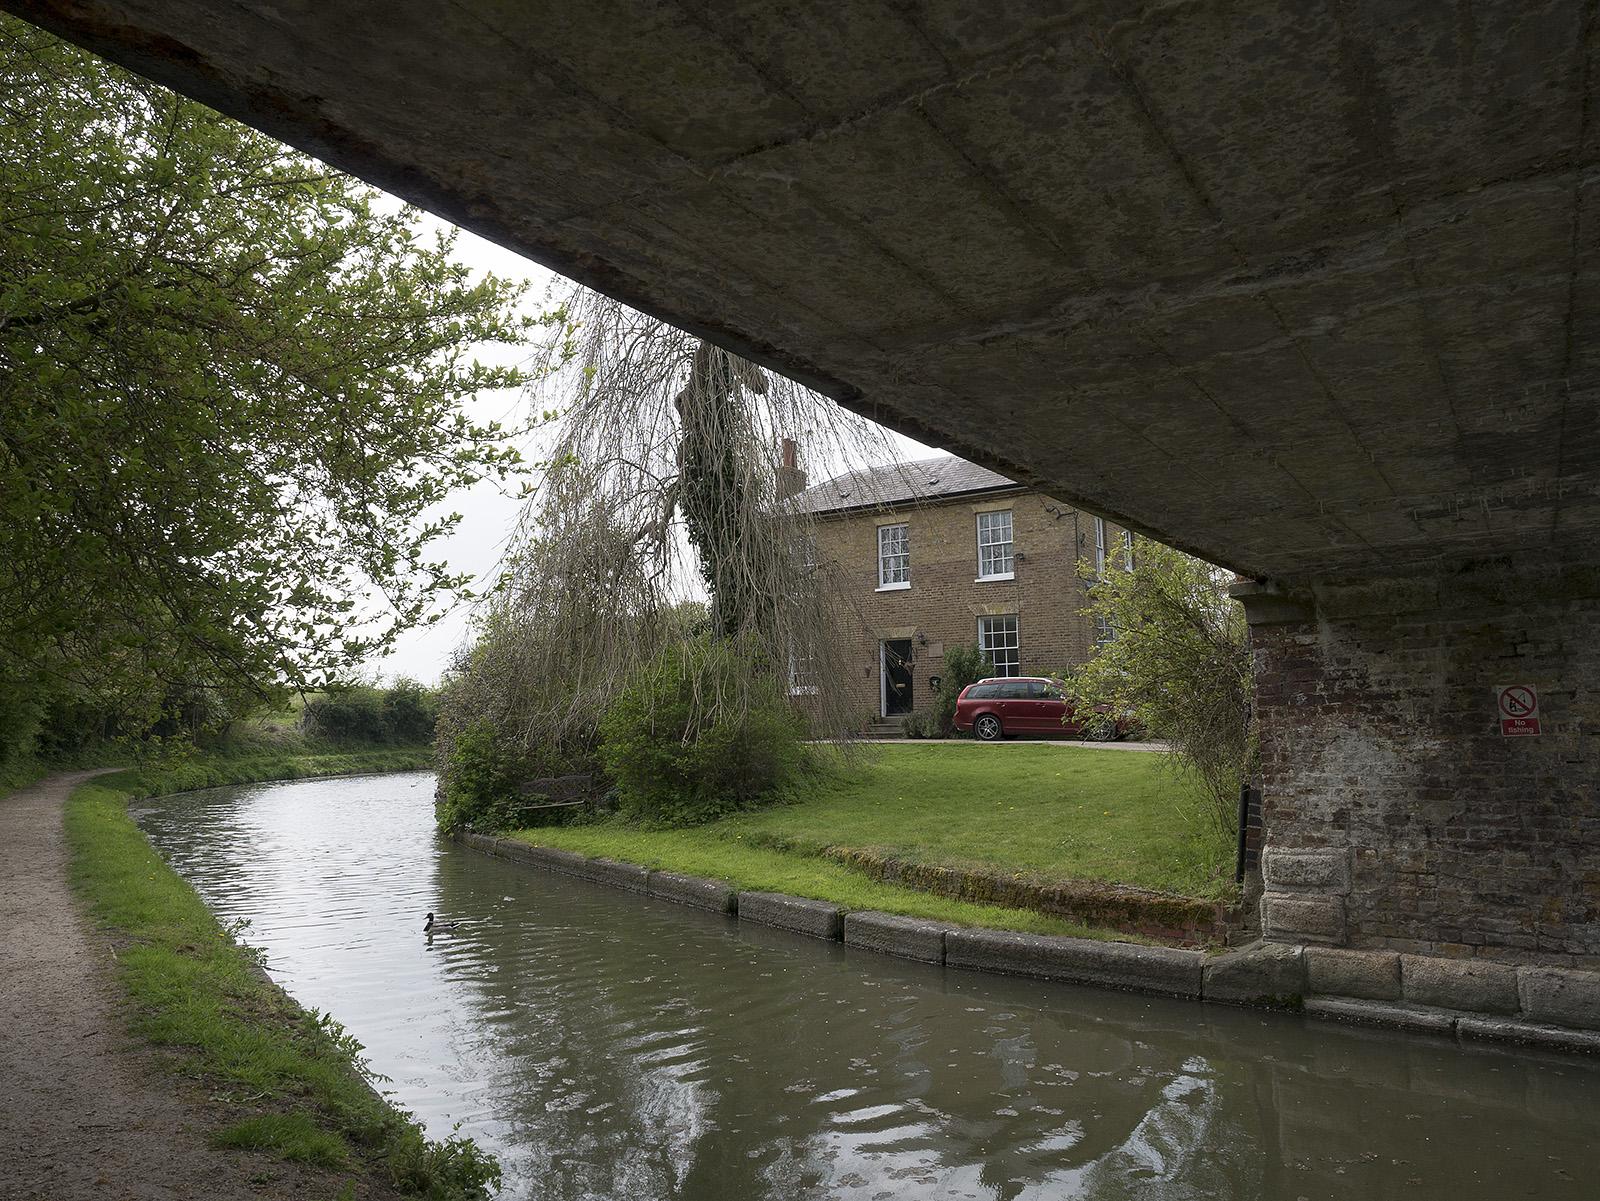 Underneath the first bridge